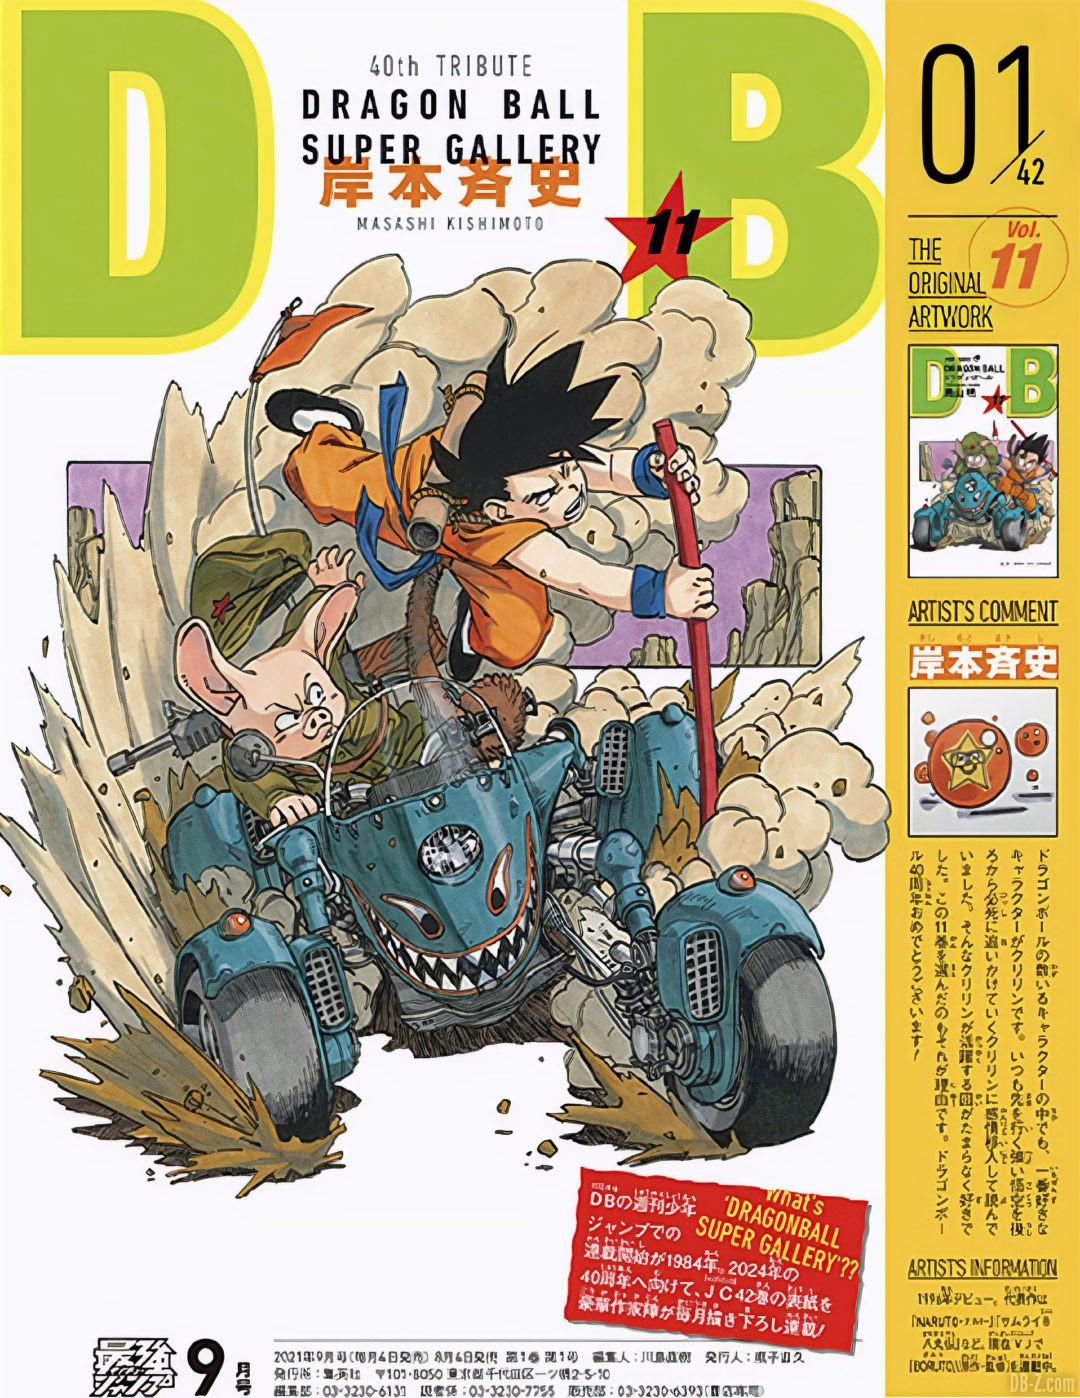 Dragon-Ball-Super-Gallery-Cover-1-par-Masashi-Kishimoto